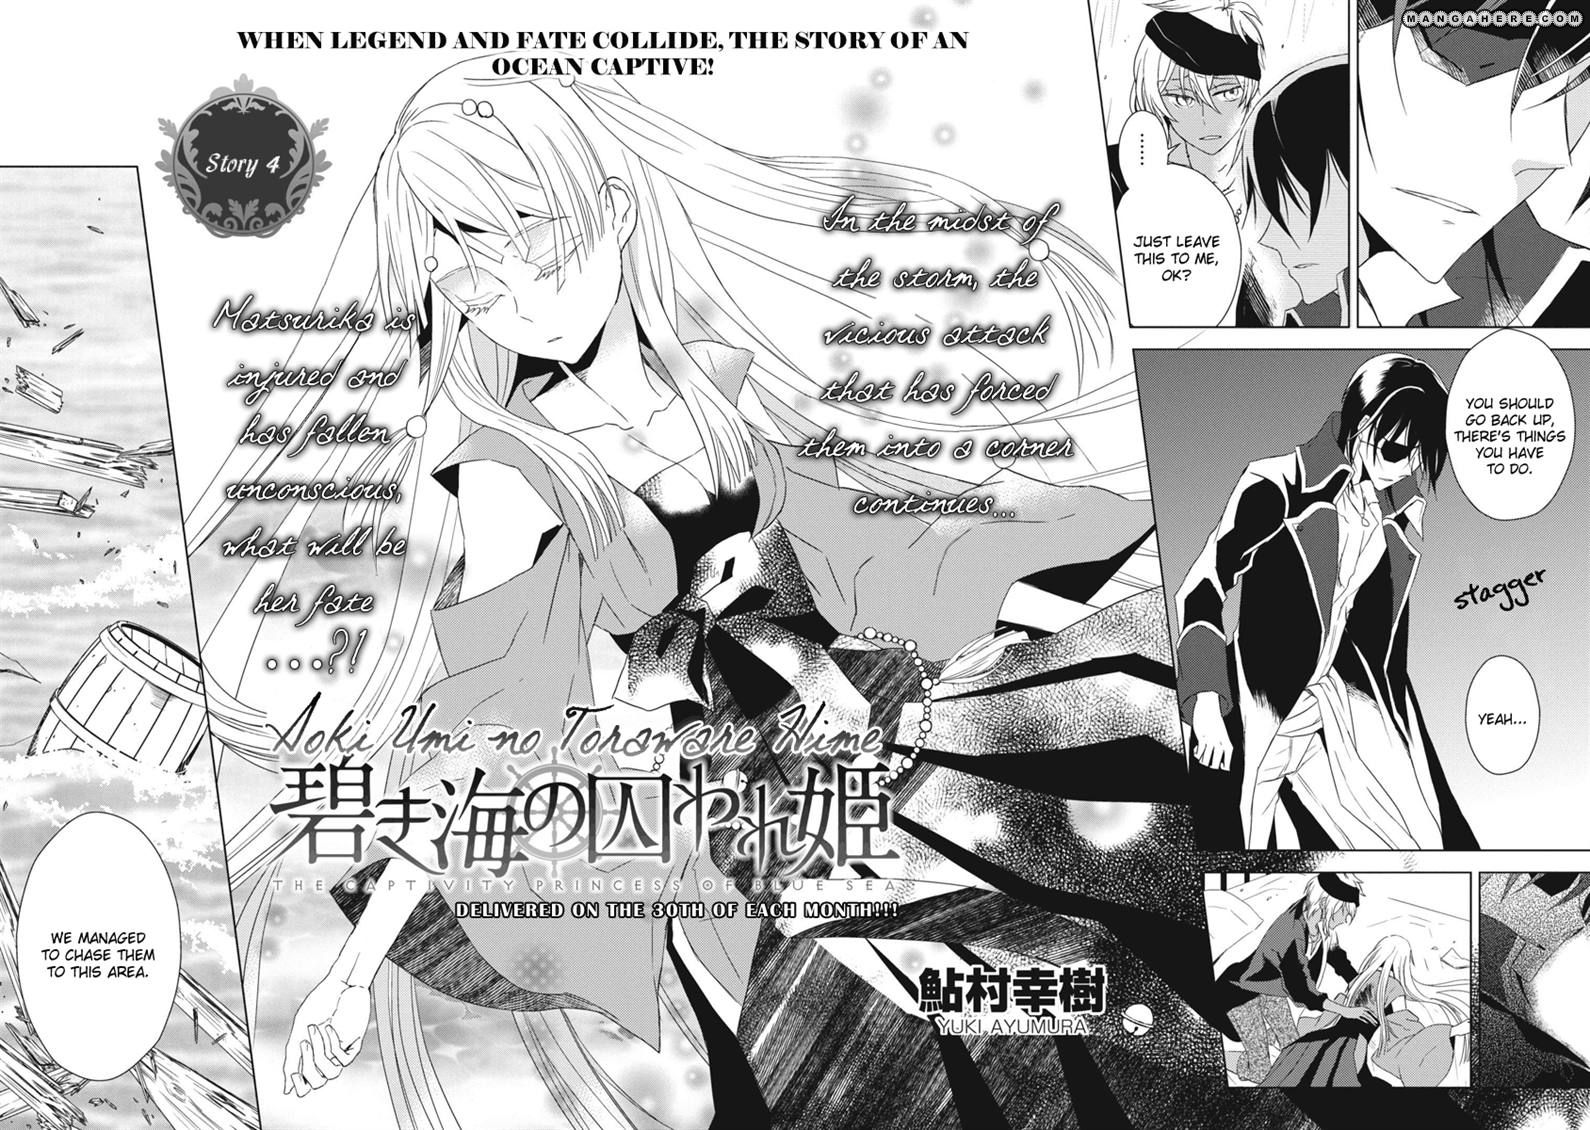 Aoki Umi no Toraware Hime 4 Page 3